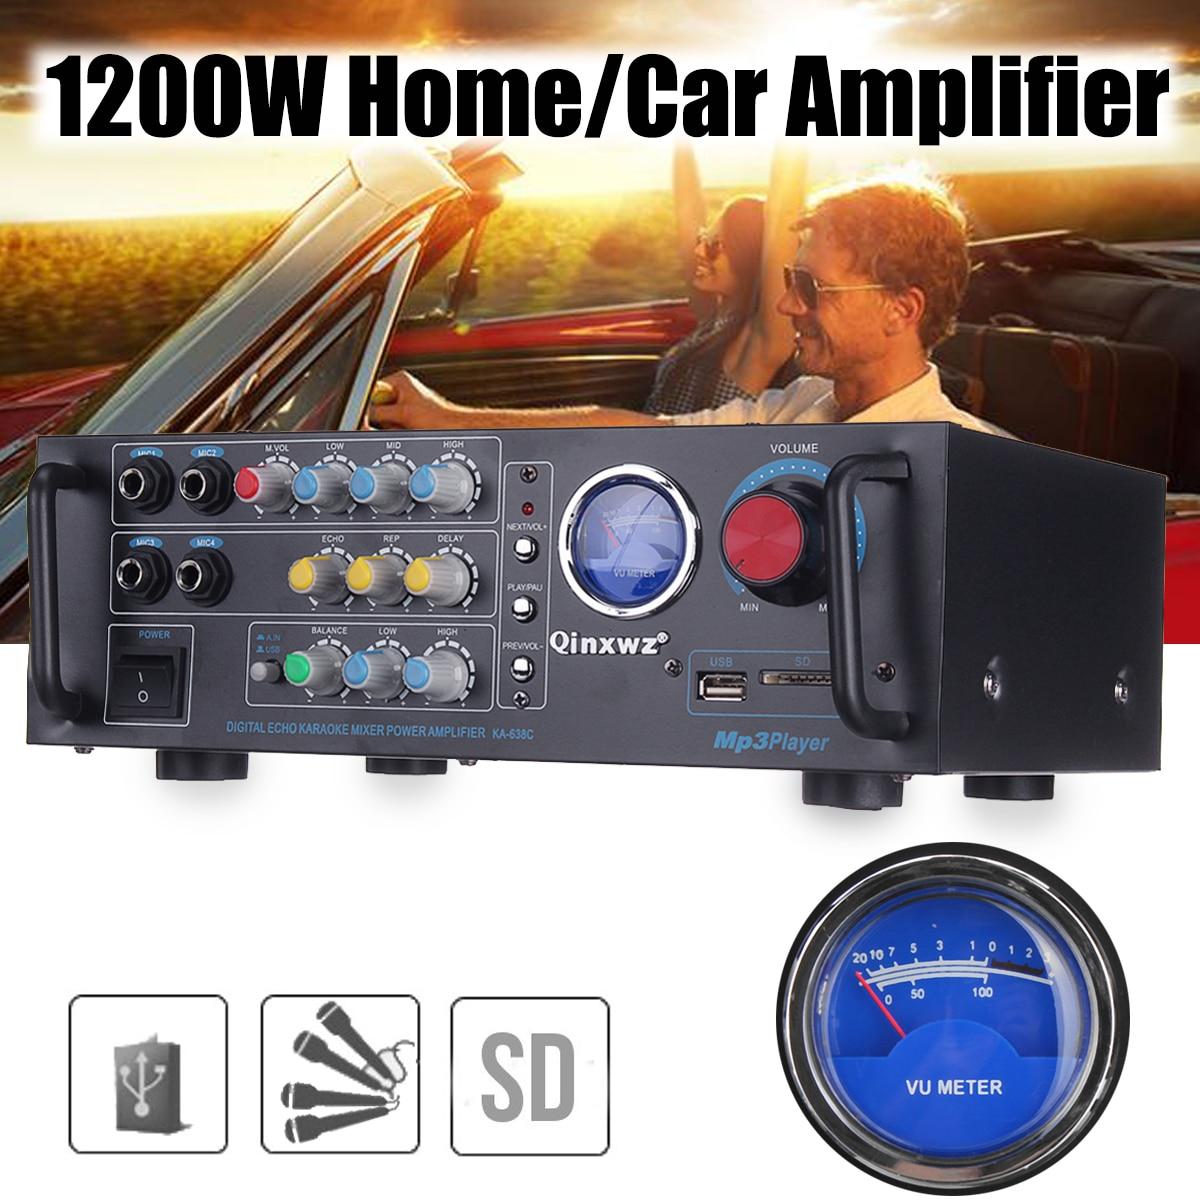 600W+600W 2 Channel HiFi Digital Audio Power Amplifier MINI Car Stereo Amplifier Super Bass with VU Meter DC12V/220V